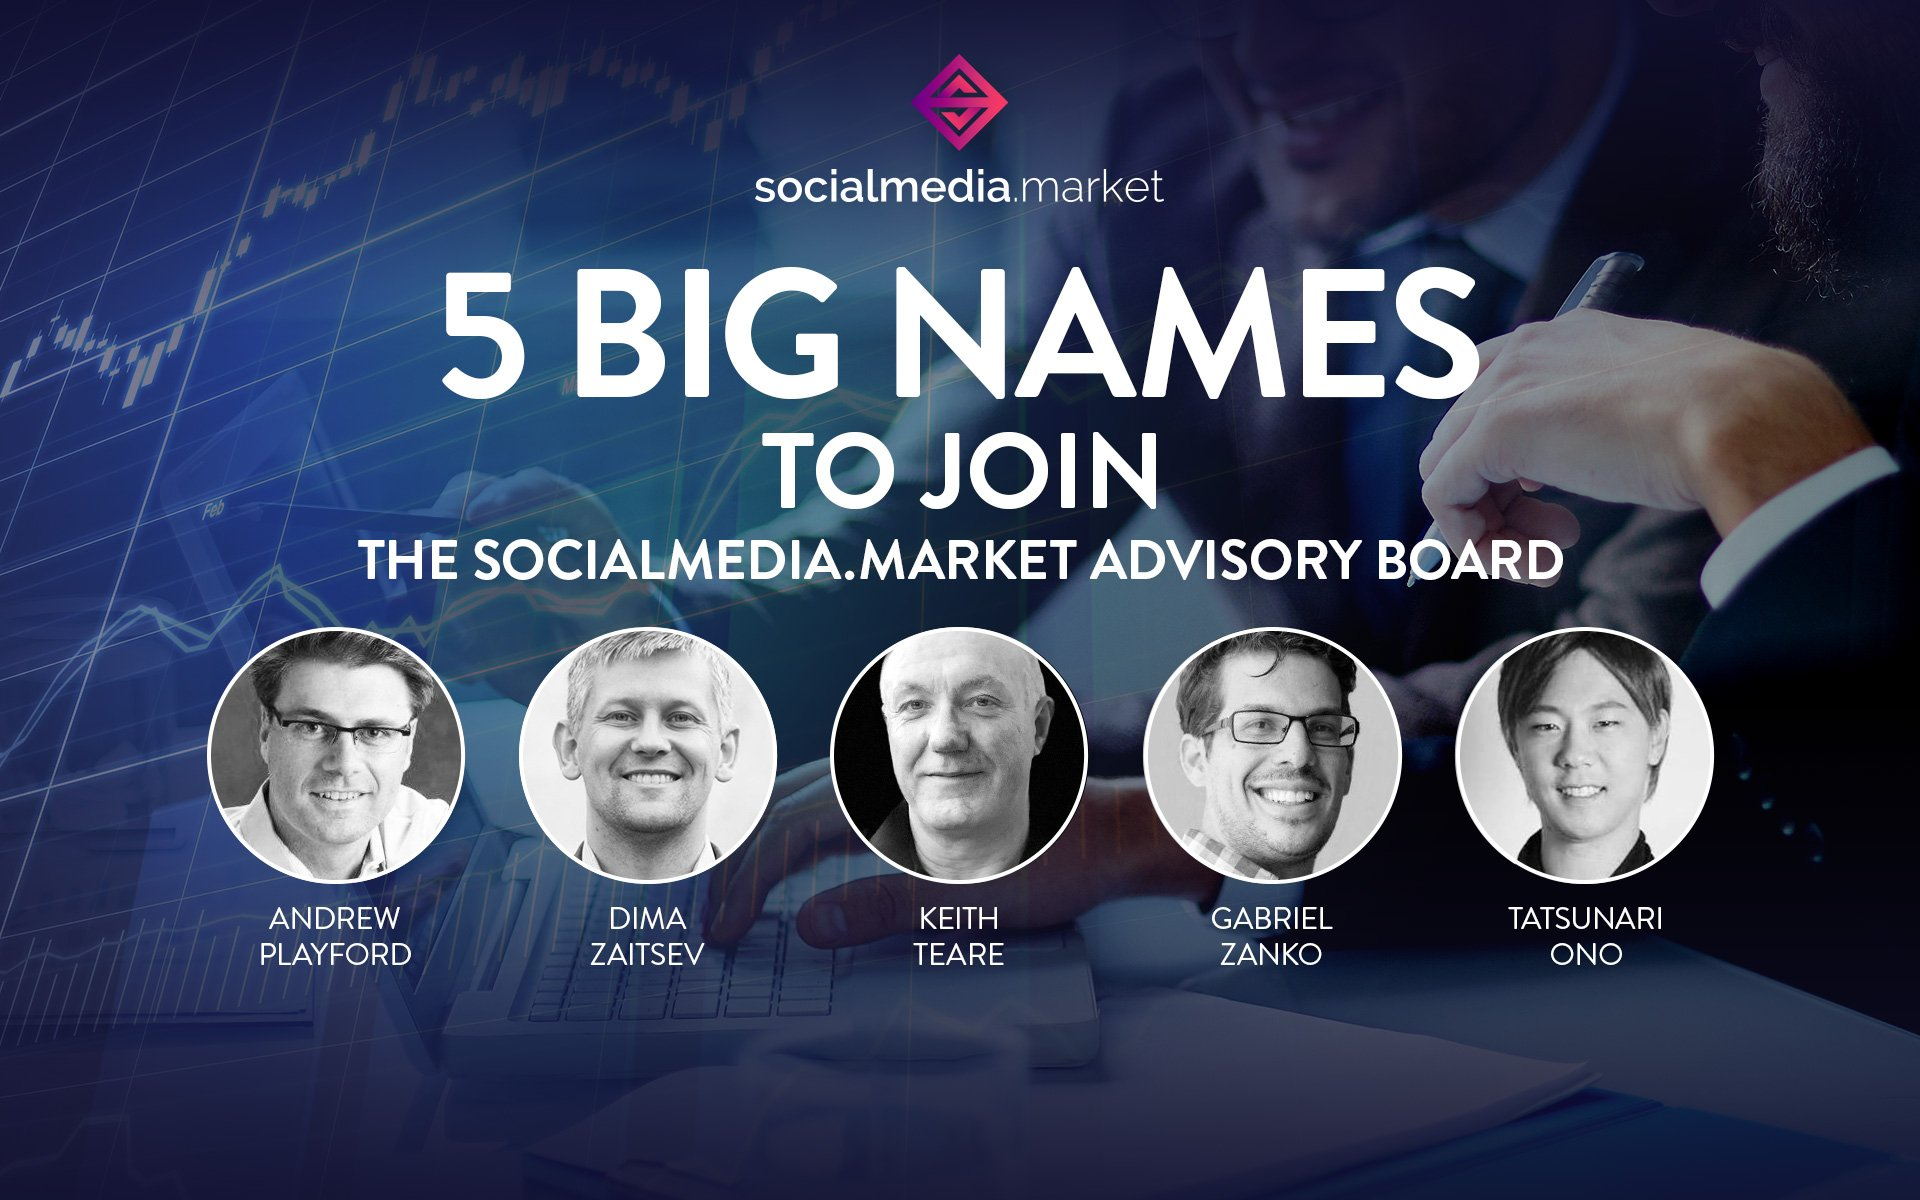 5 Big Names to Join the SocialMedia.Market Advisory Board